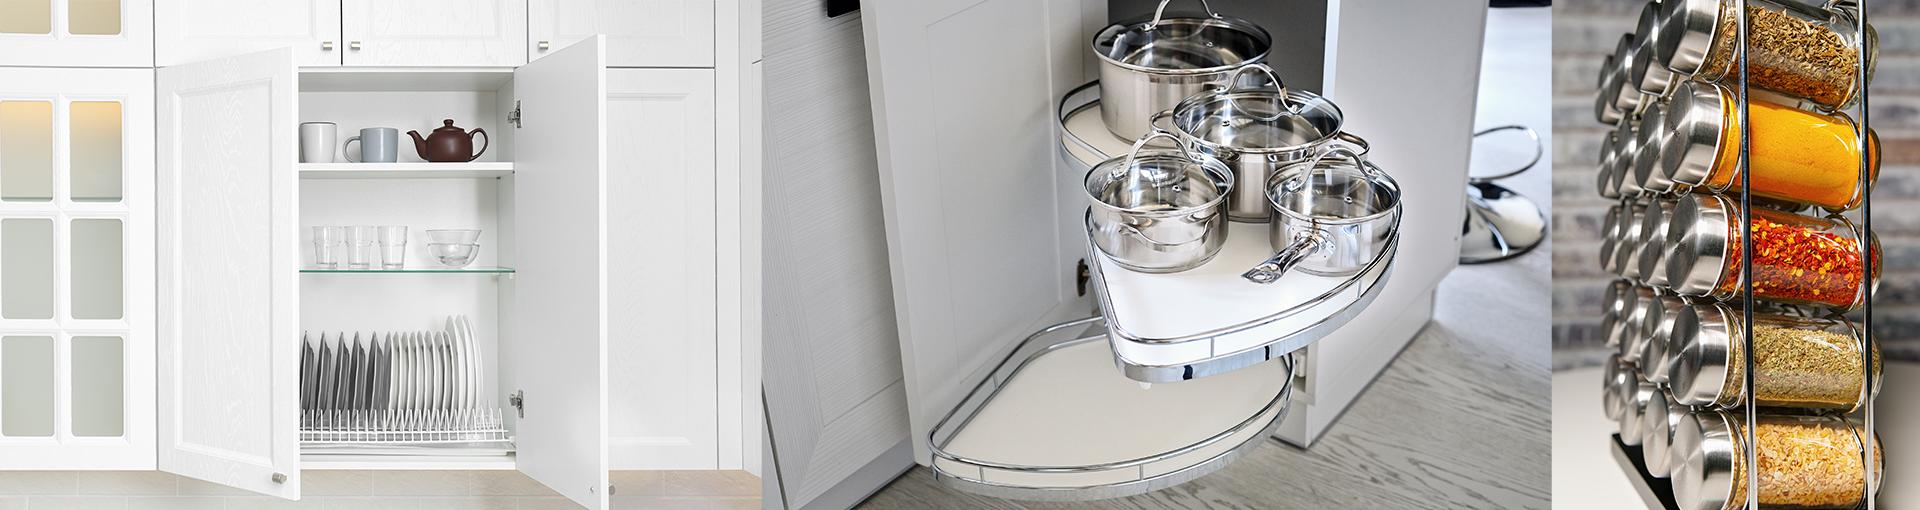 Custom Kitchen Cabinets   Oasis Kitchens